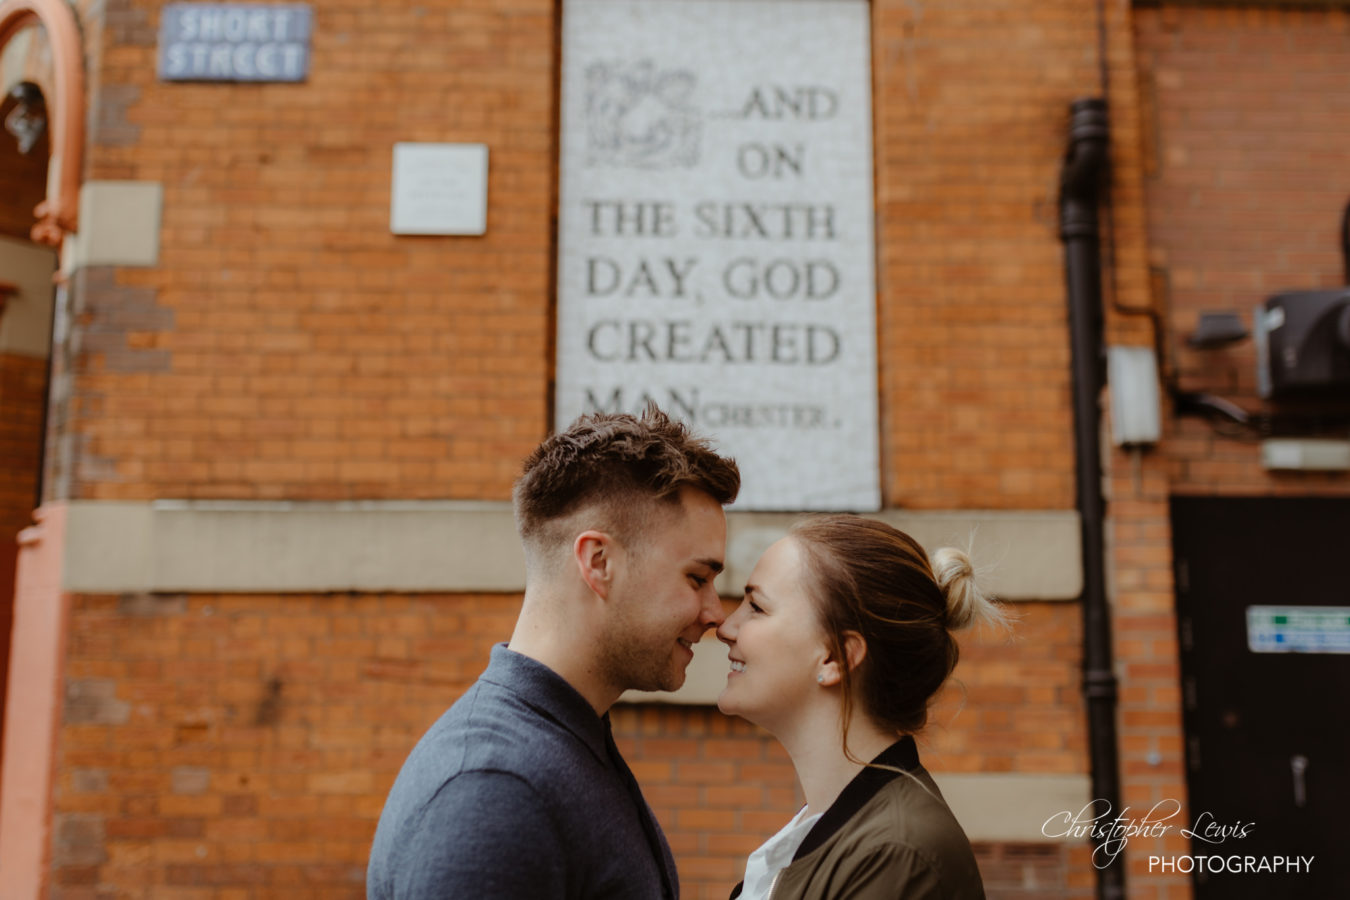 Northern-Quarter-Manchester-Pre-Wedding-Photoshoot-25